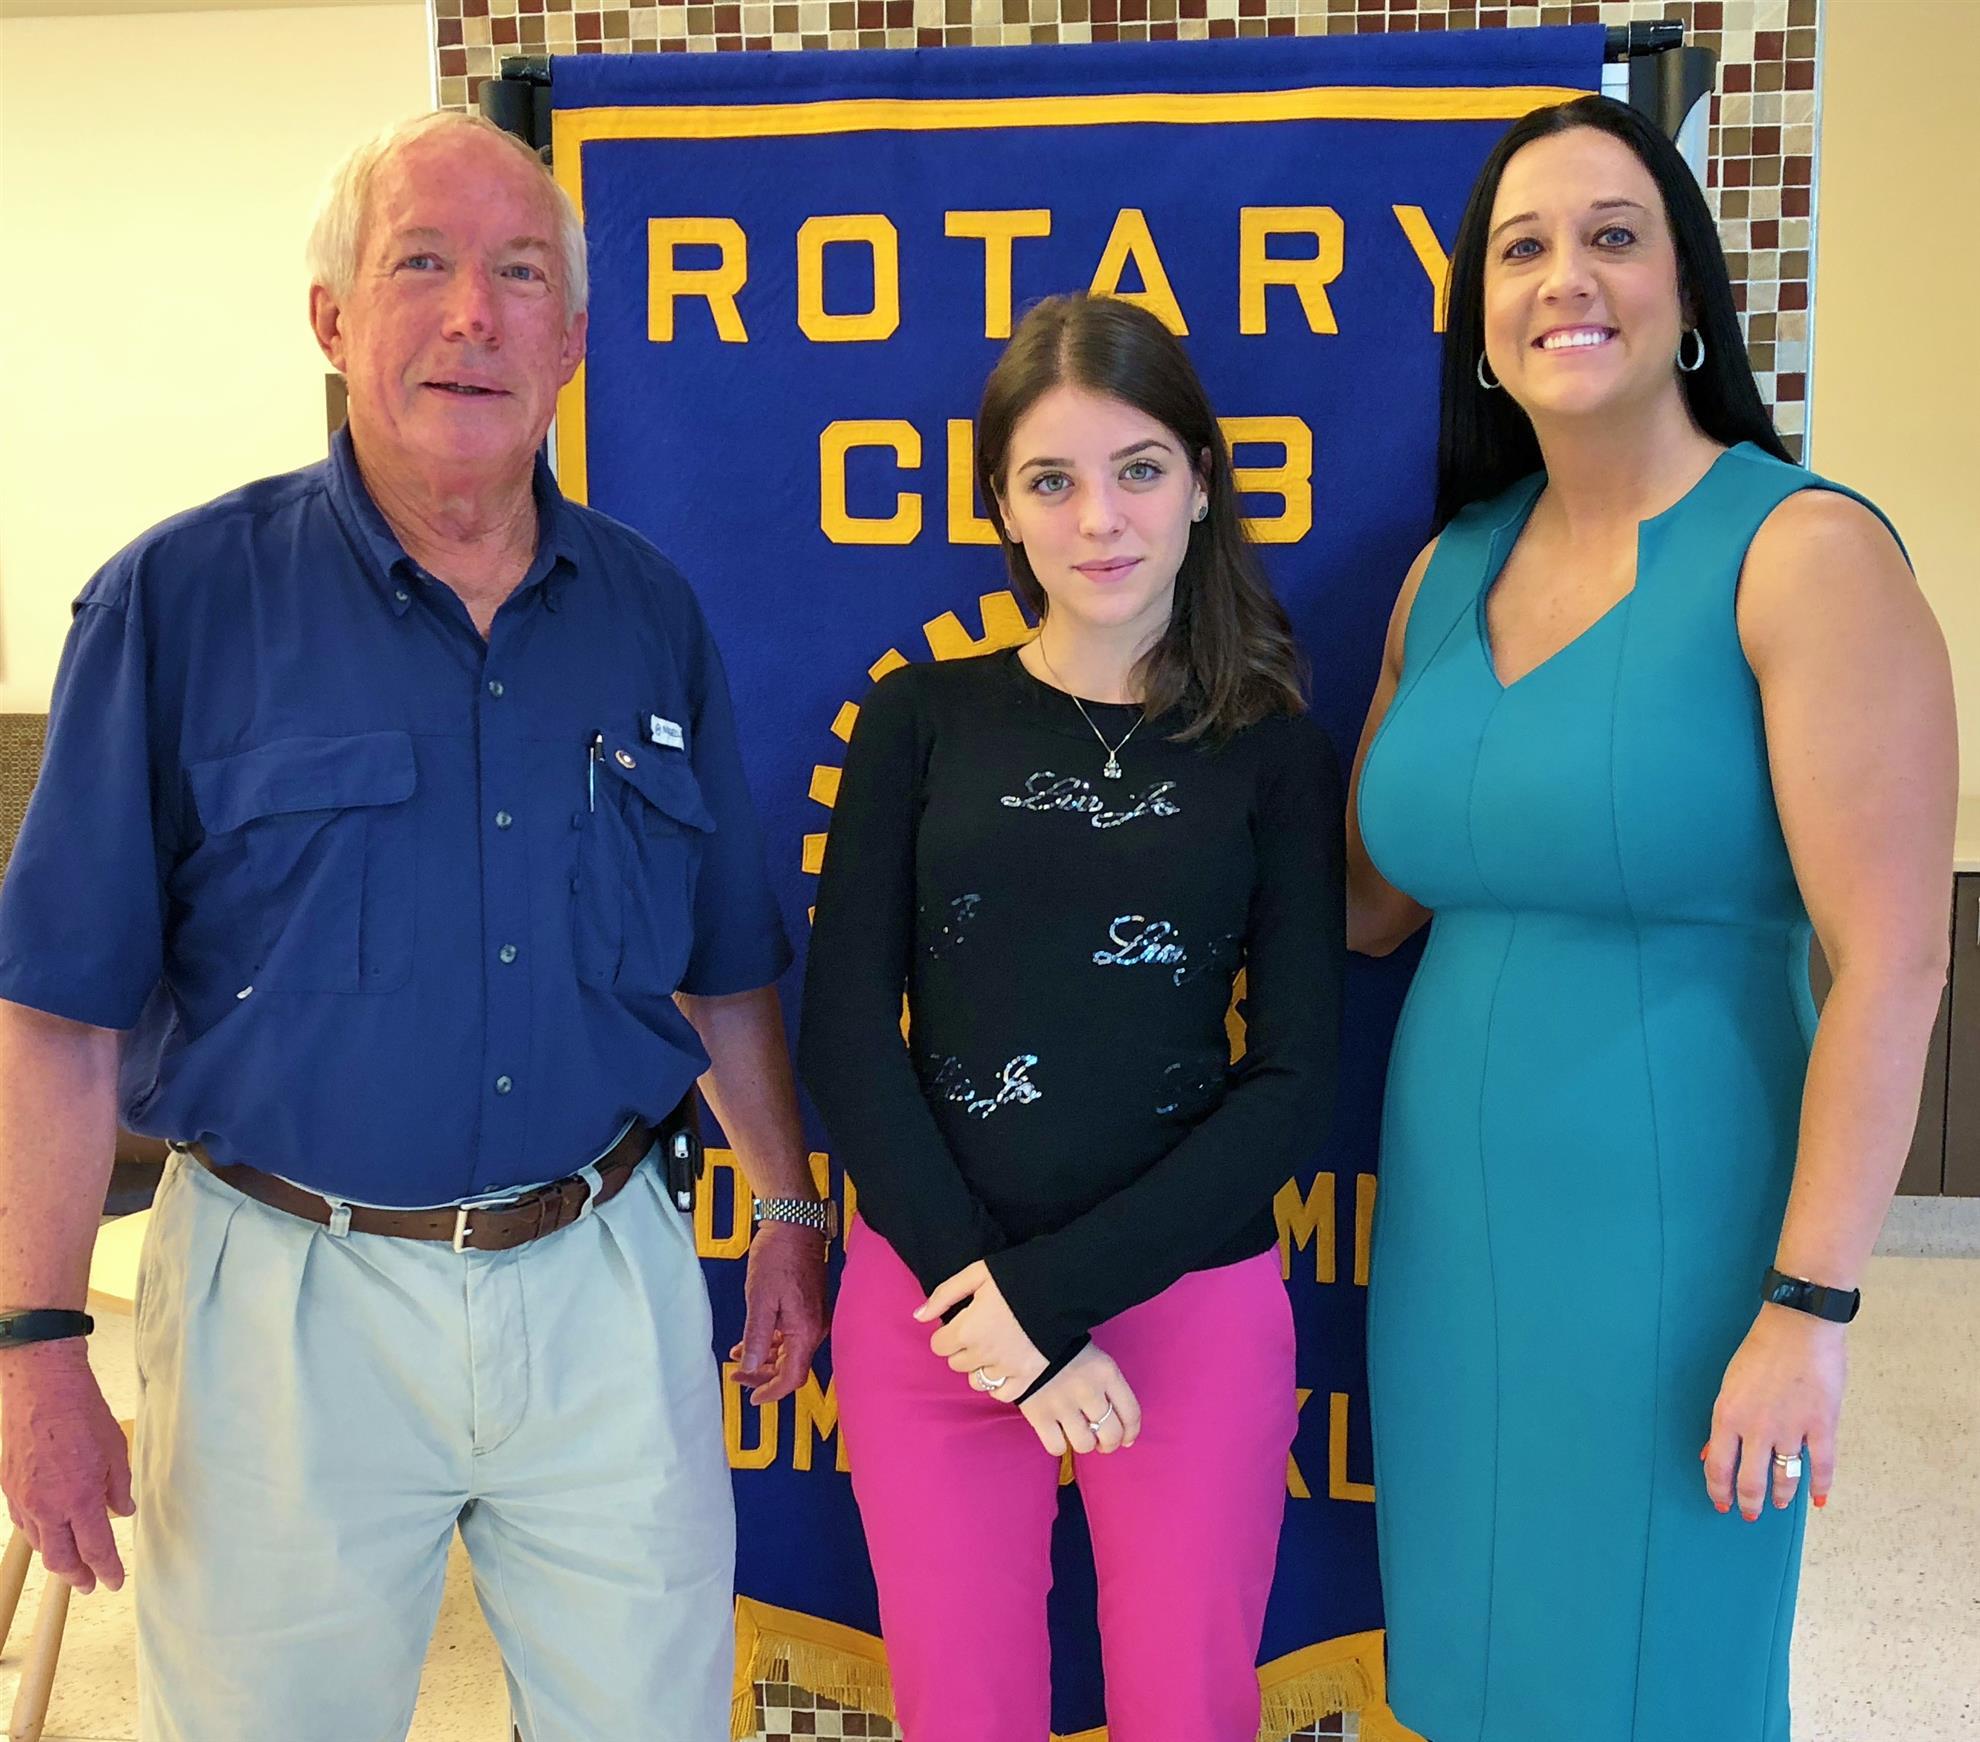 Stories | Edmond Summit Rotary Club #51552